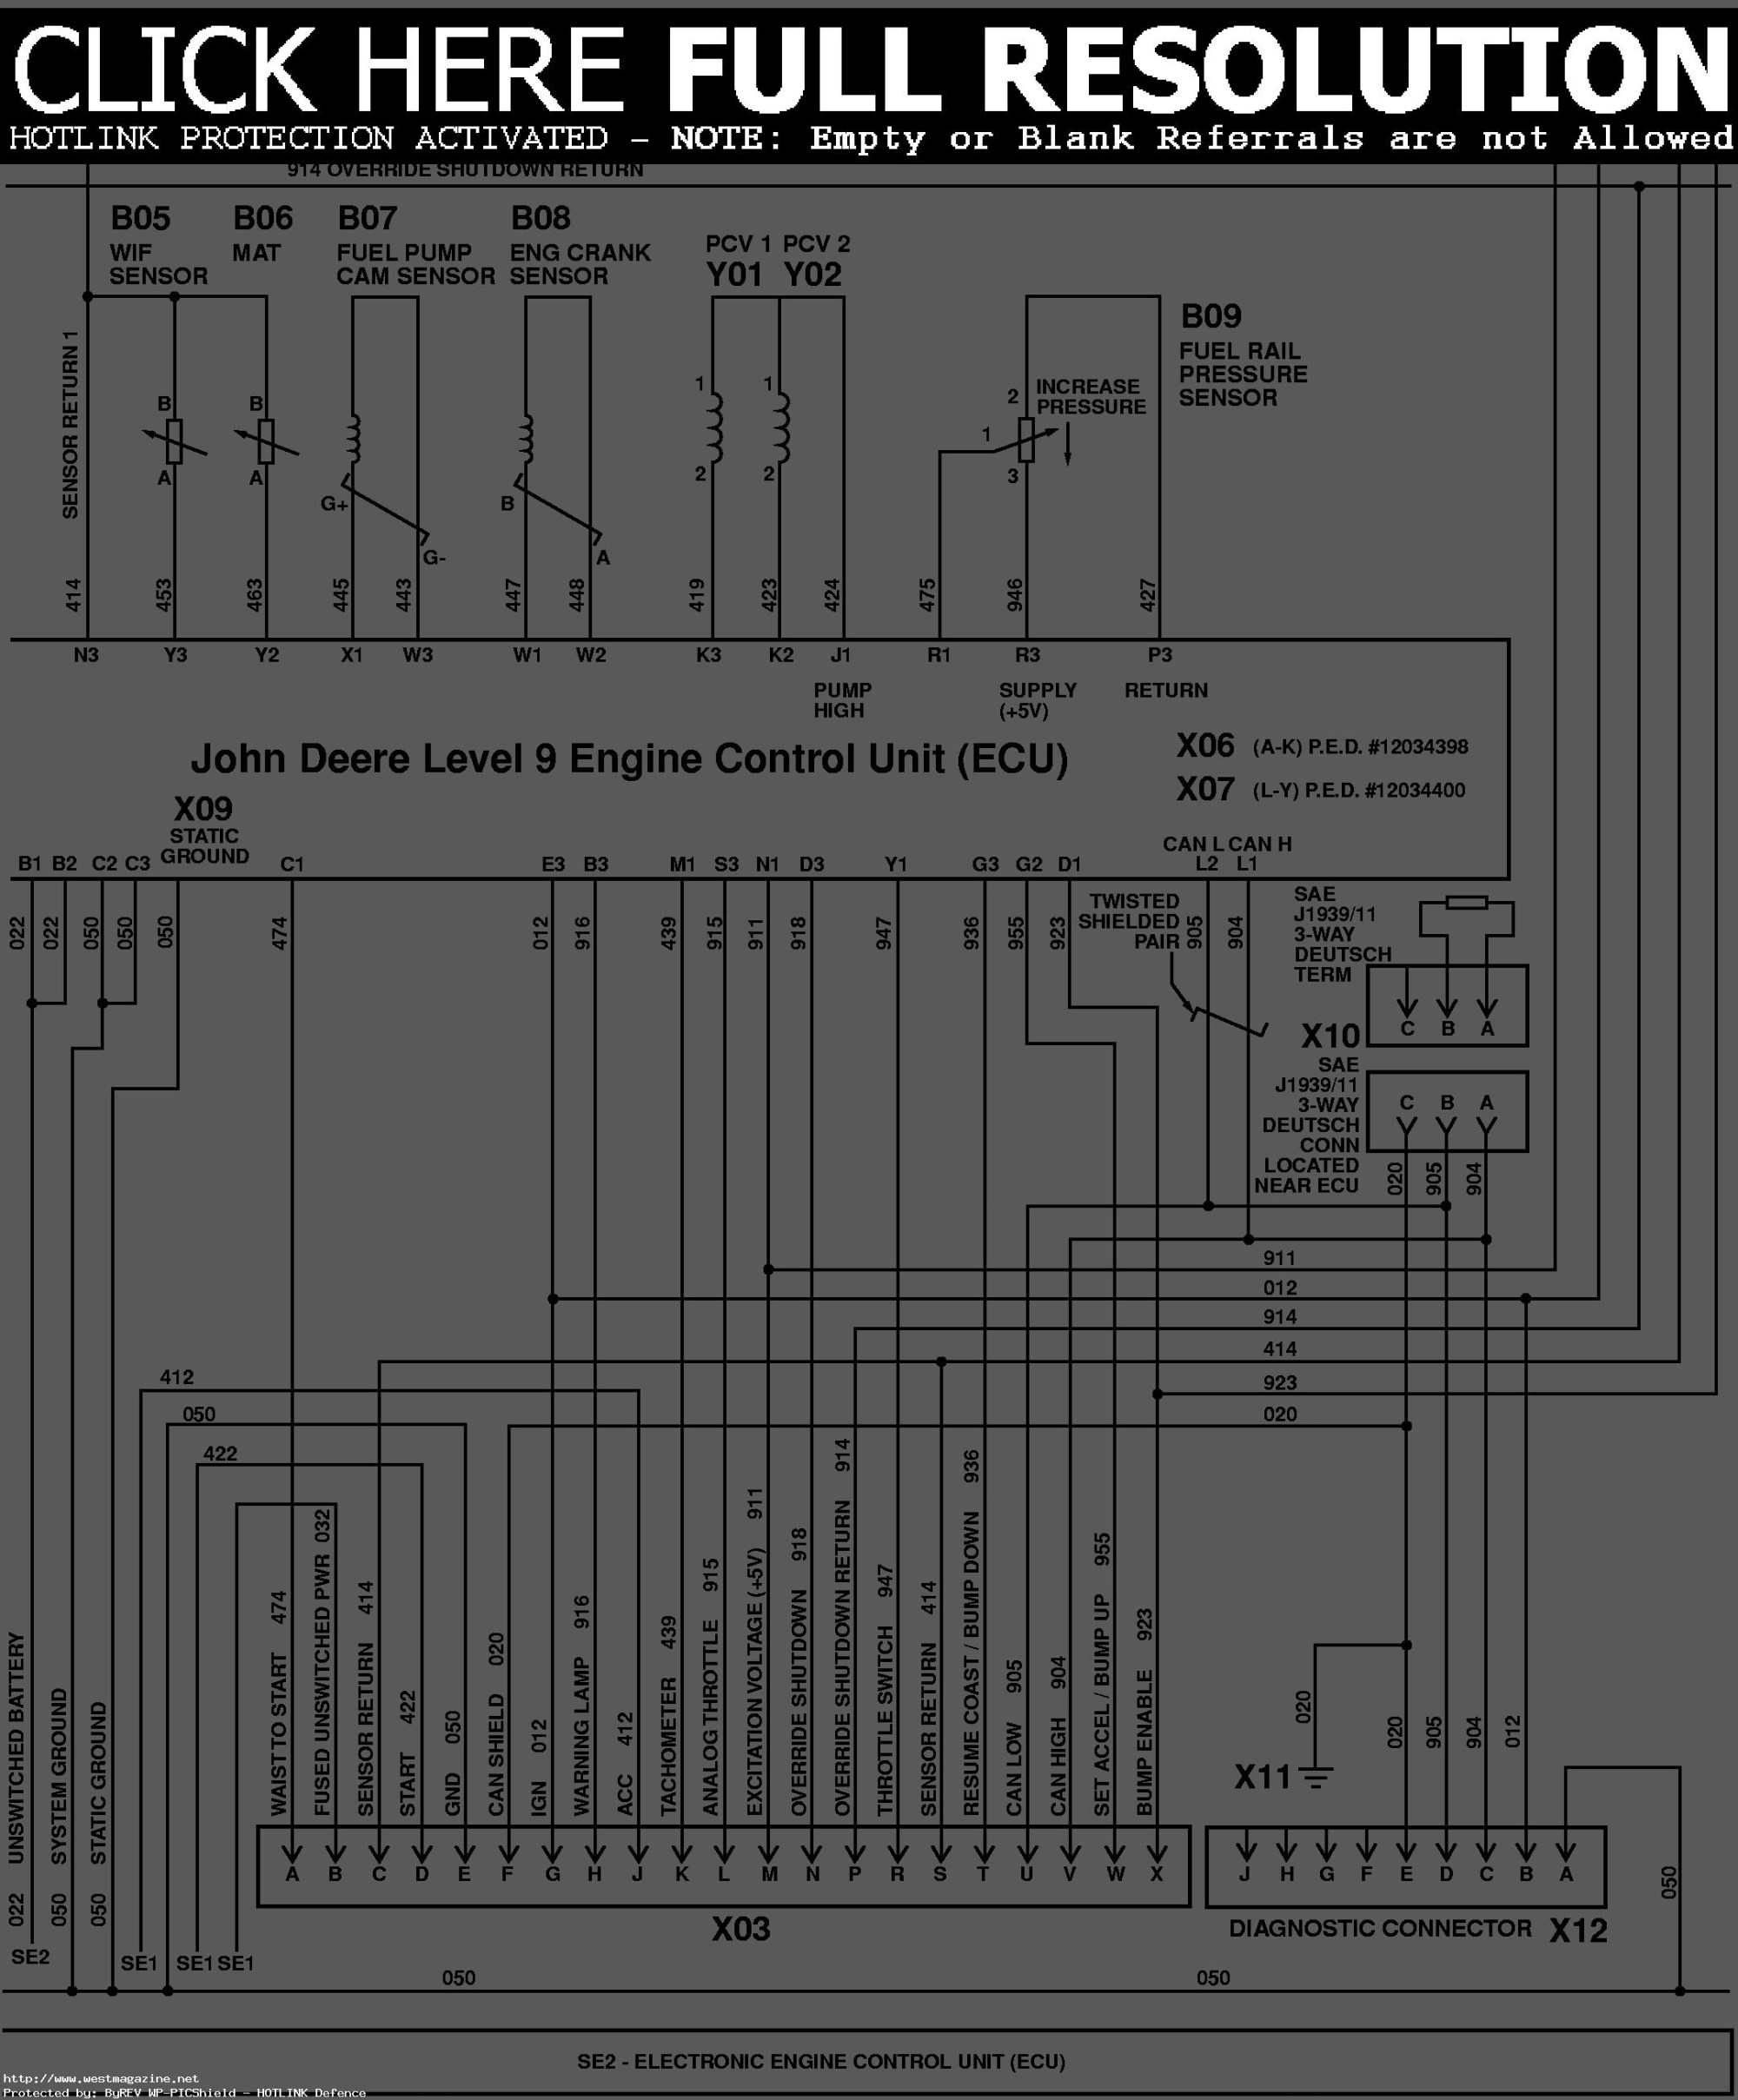 hight resolution of john deere lt 155 wiring diagram john deere lt133 wiring schematicjohn john deere lt155 wiring diagram